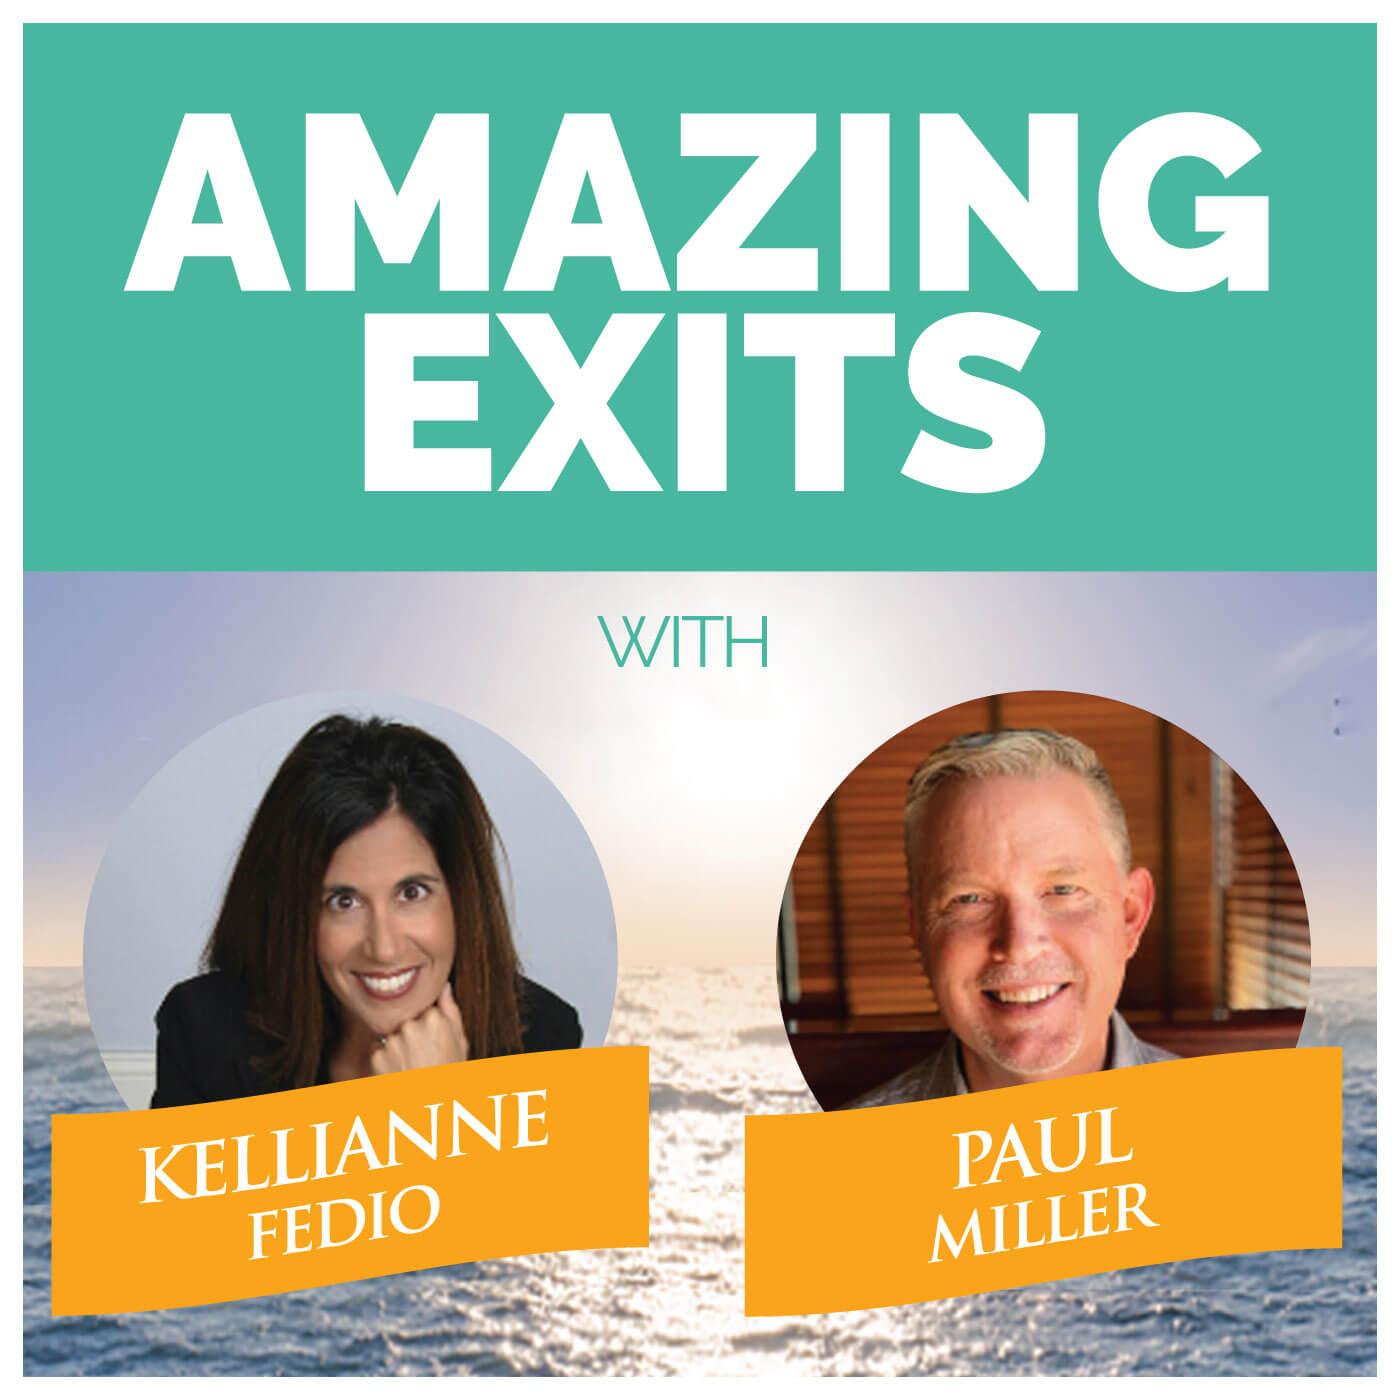 Amazing Exits Podcast show art